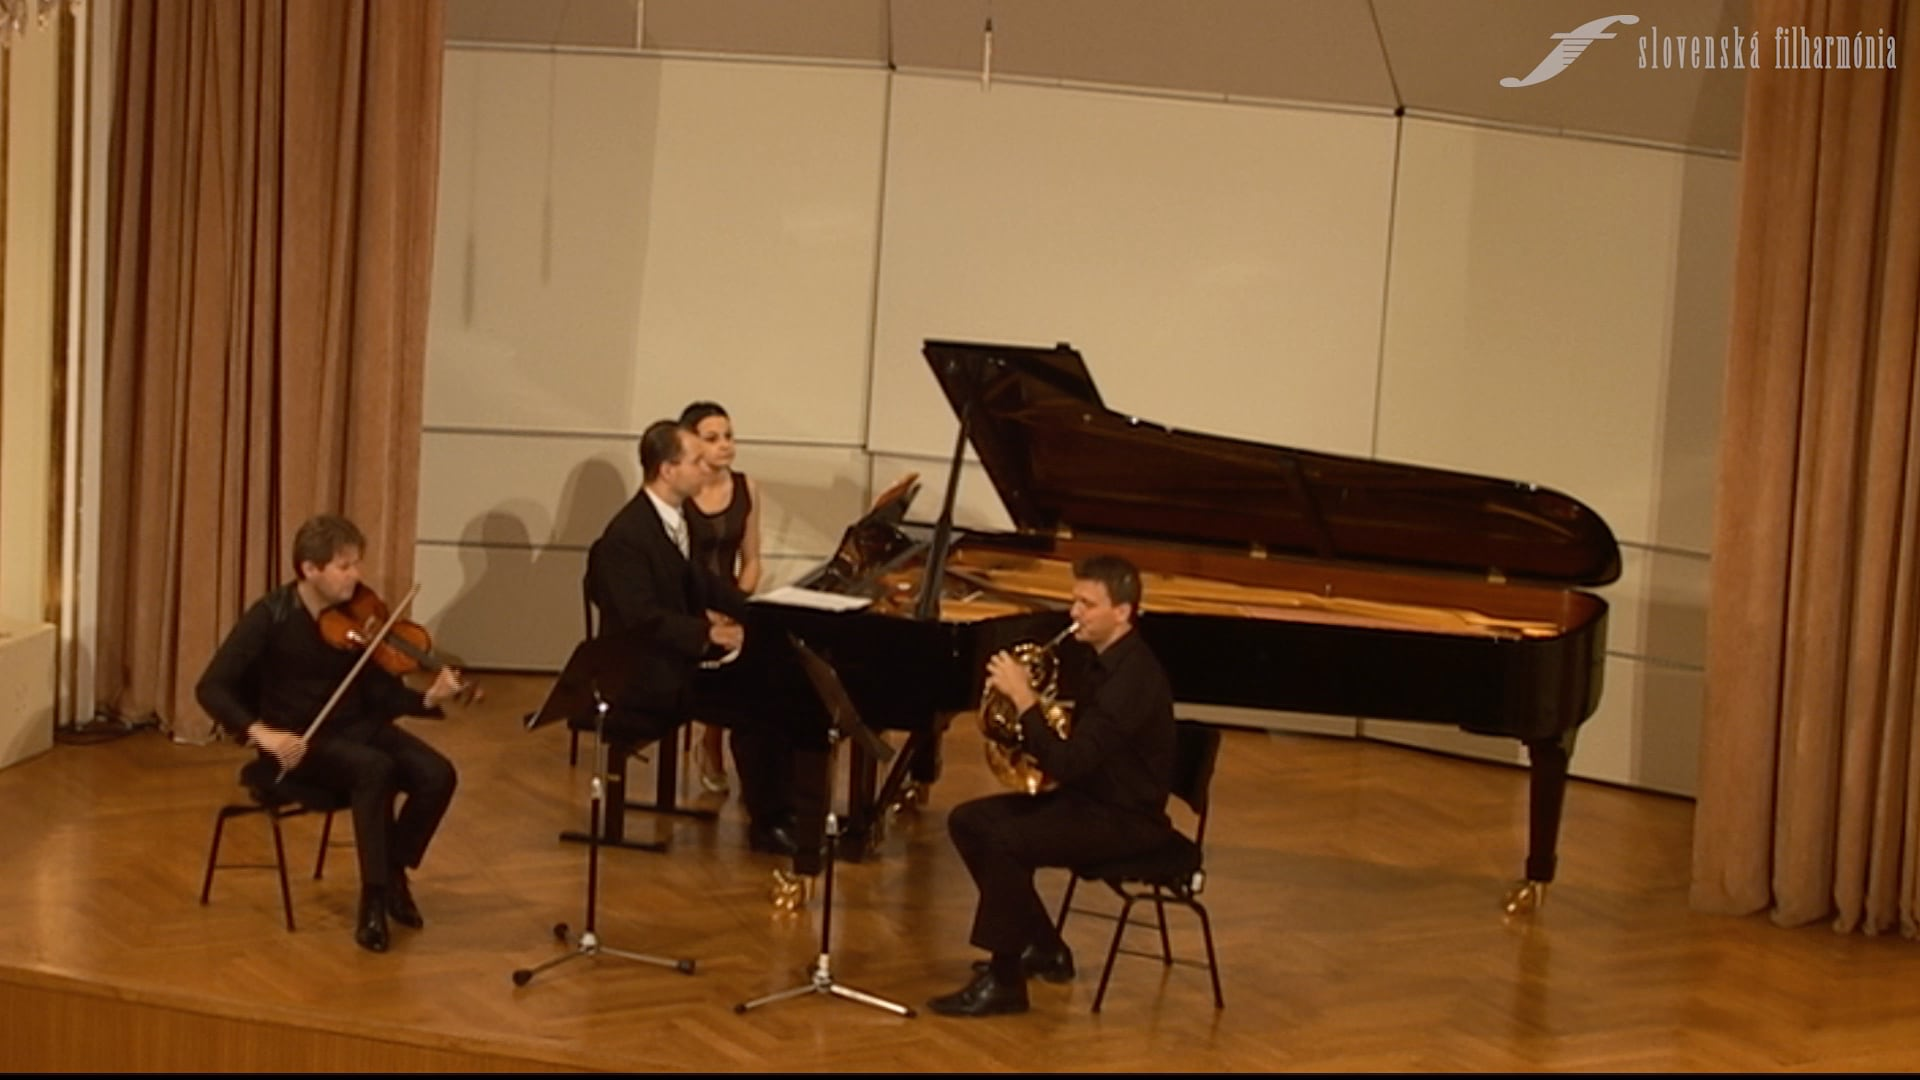 Duvernoy, Krák, Brahms